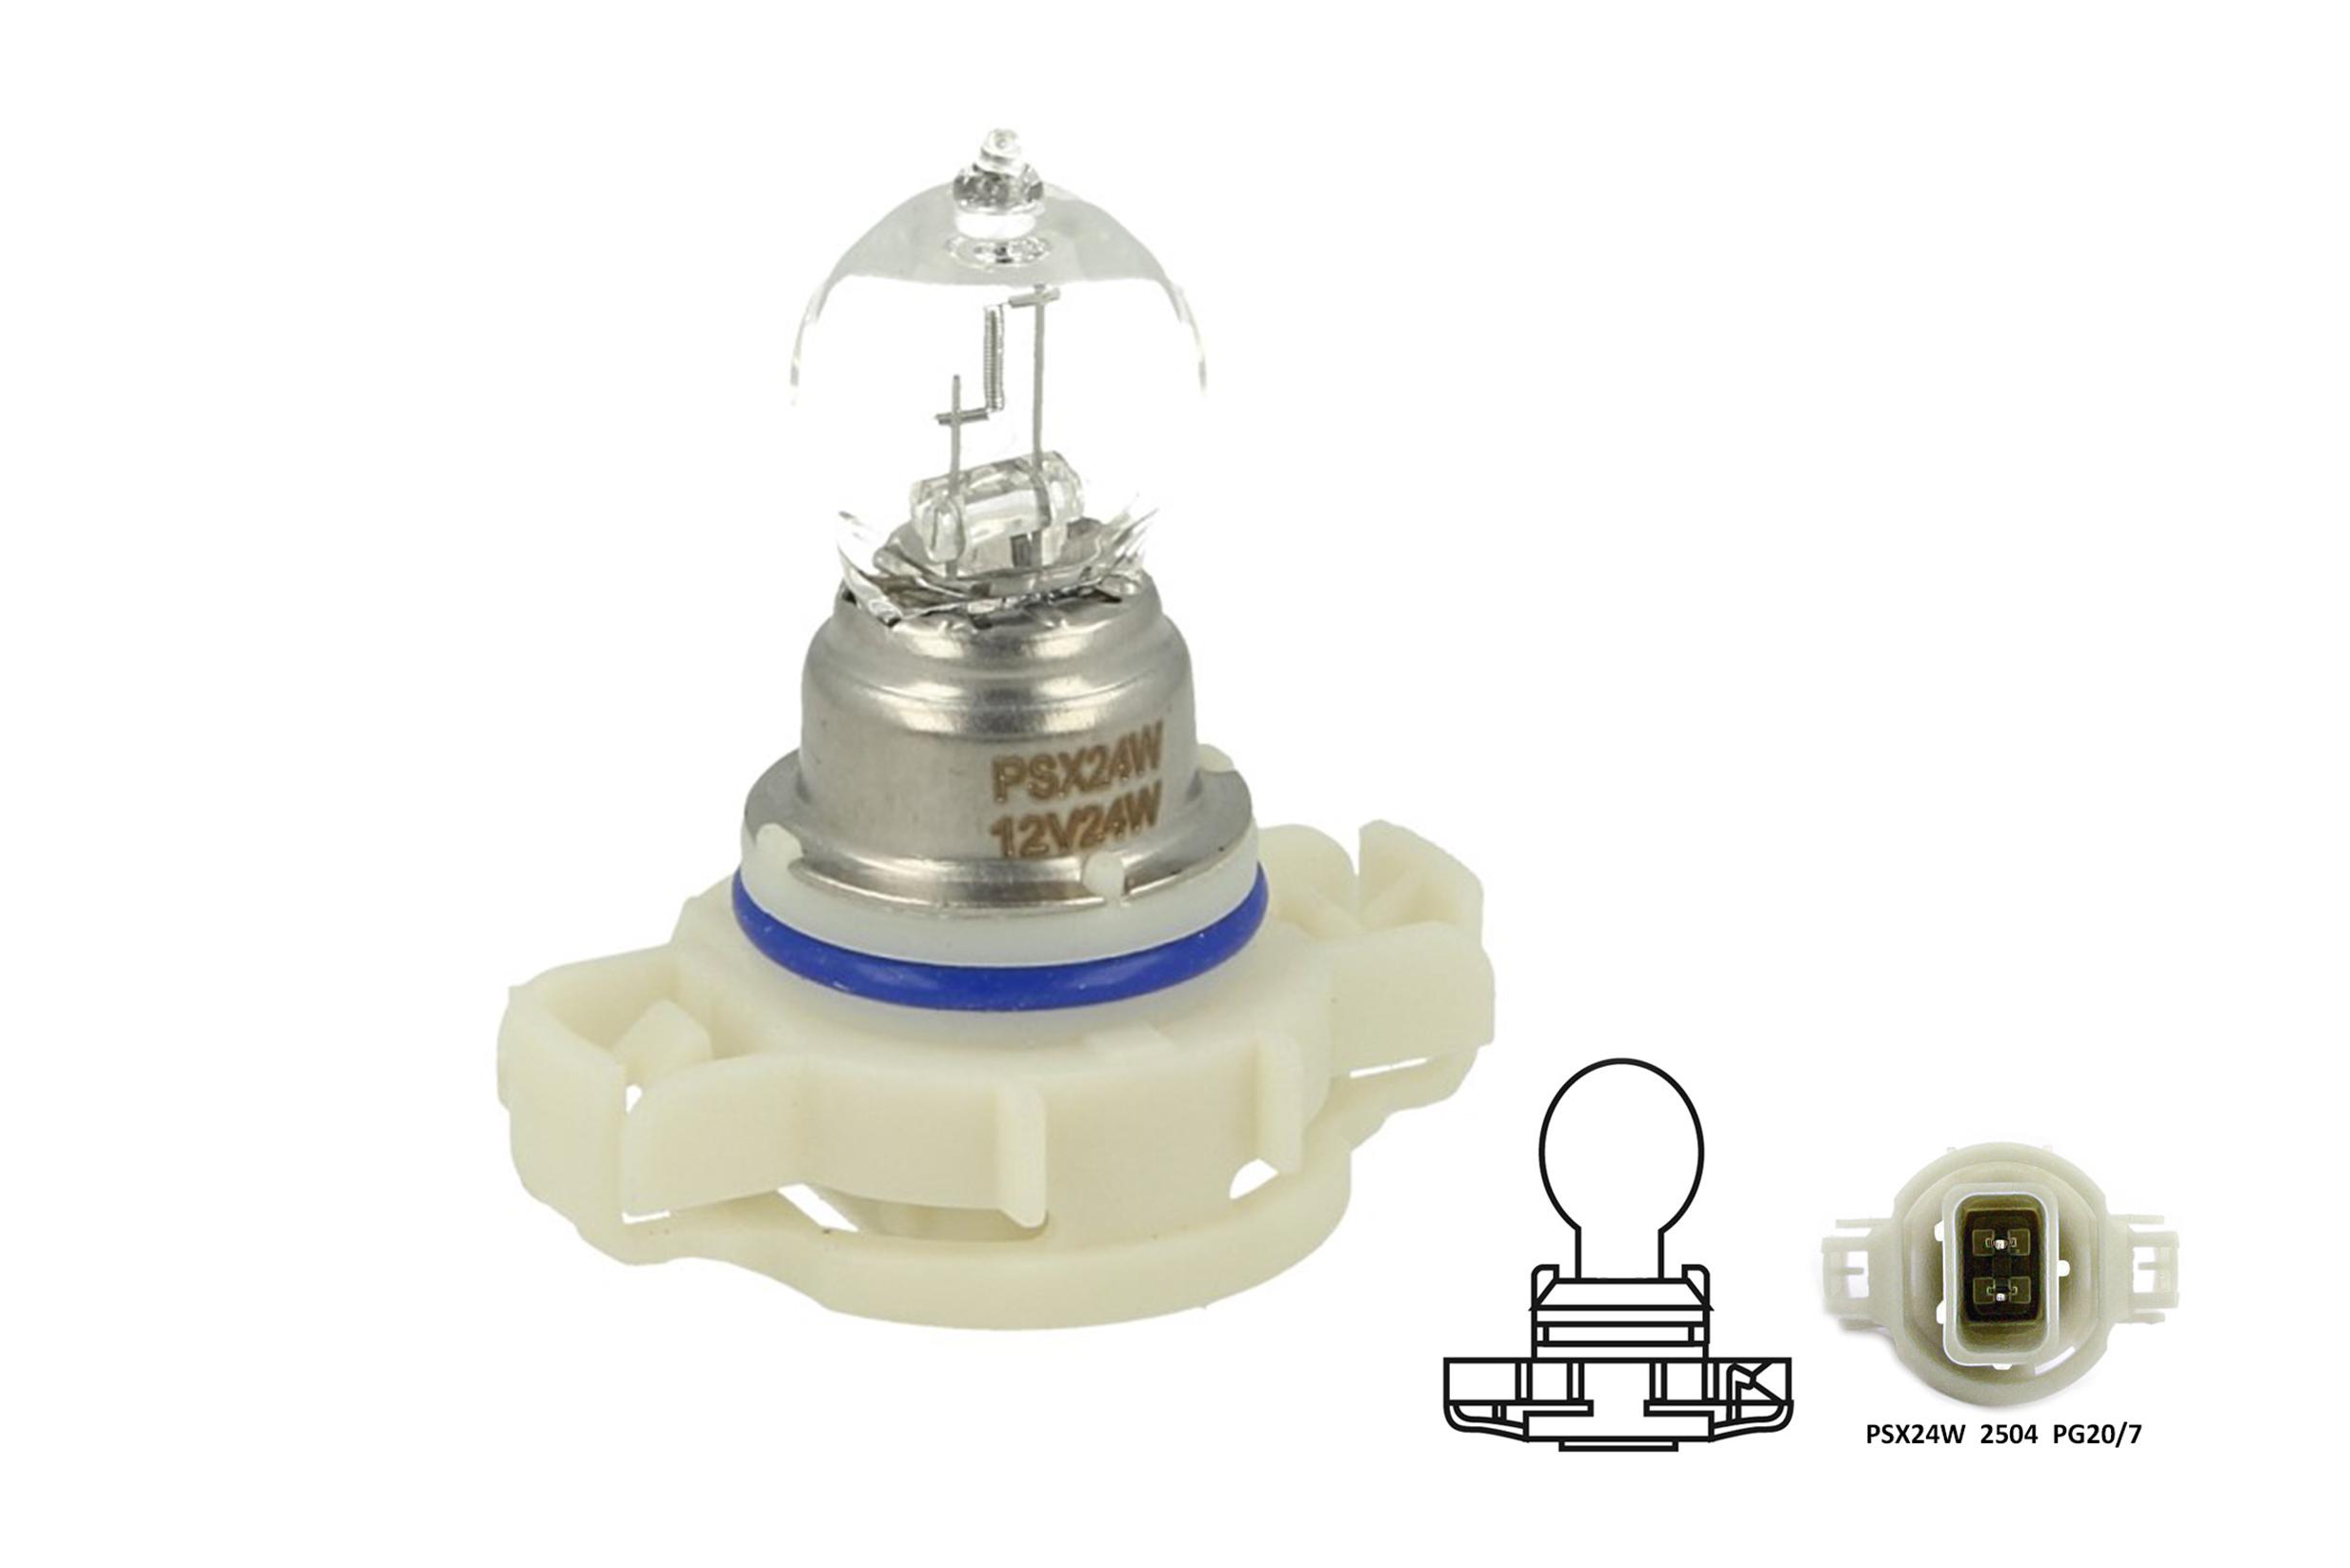 Lampada Alogena PSX24W 12V 24W PG20-7 Clear Compatibile Philips 12276 C1 - PZ